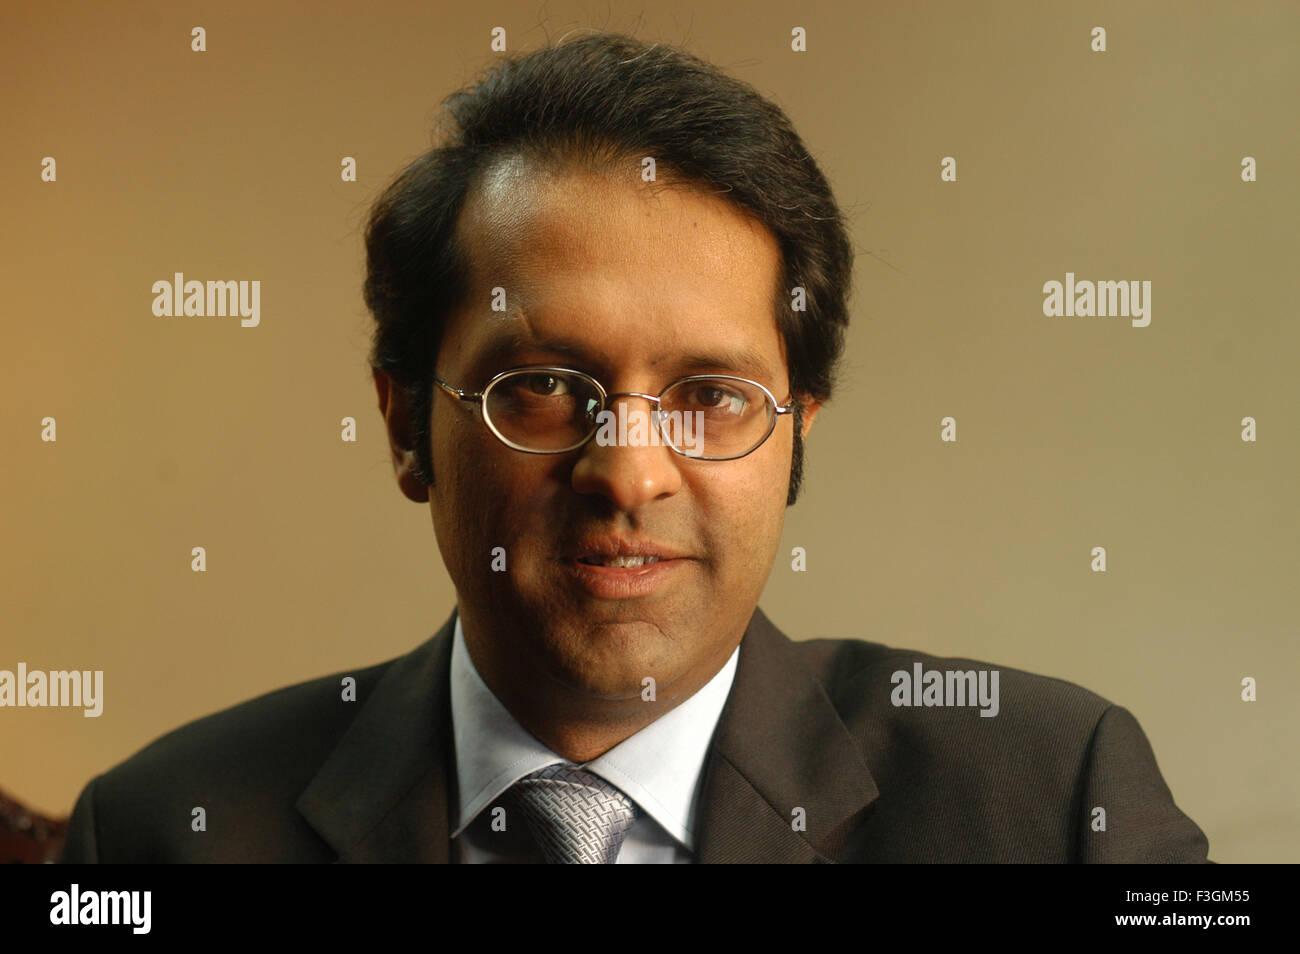 Vivek Saraogi Managing Director Balrampur Chini mills NO MR - Stock Image